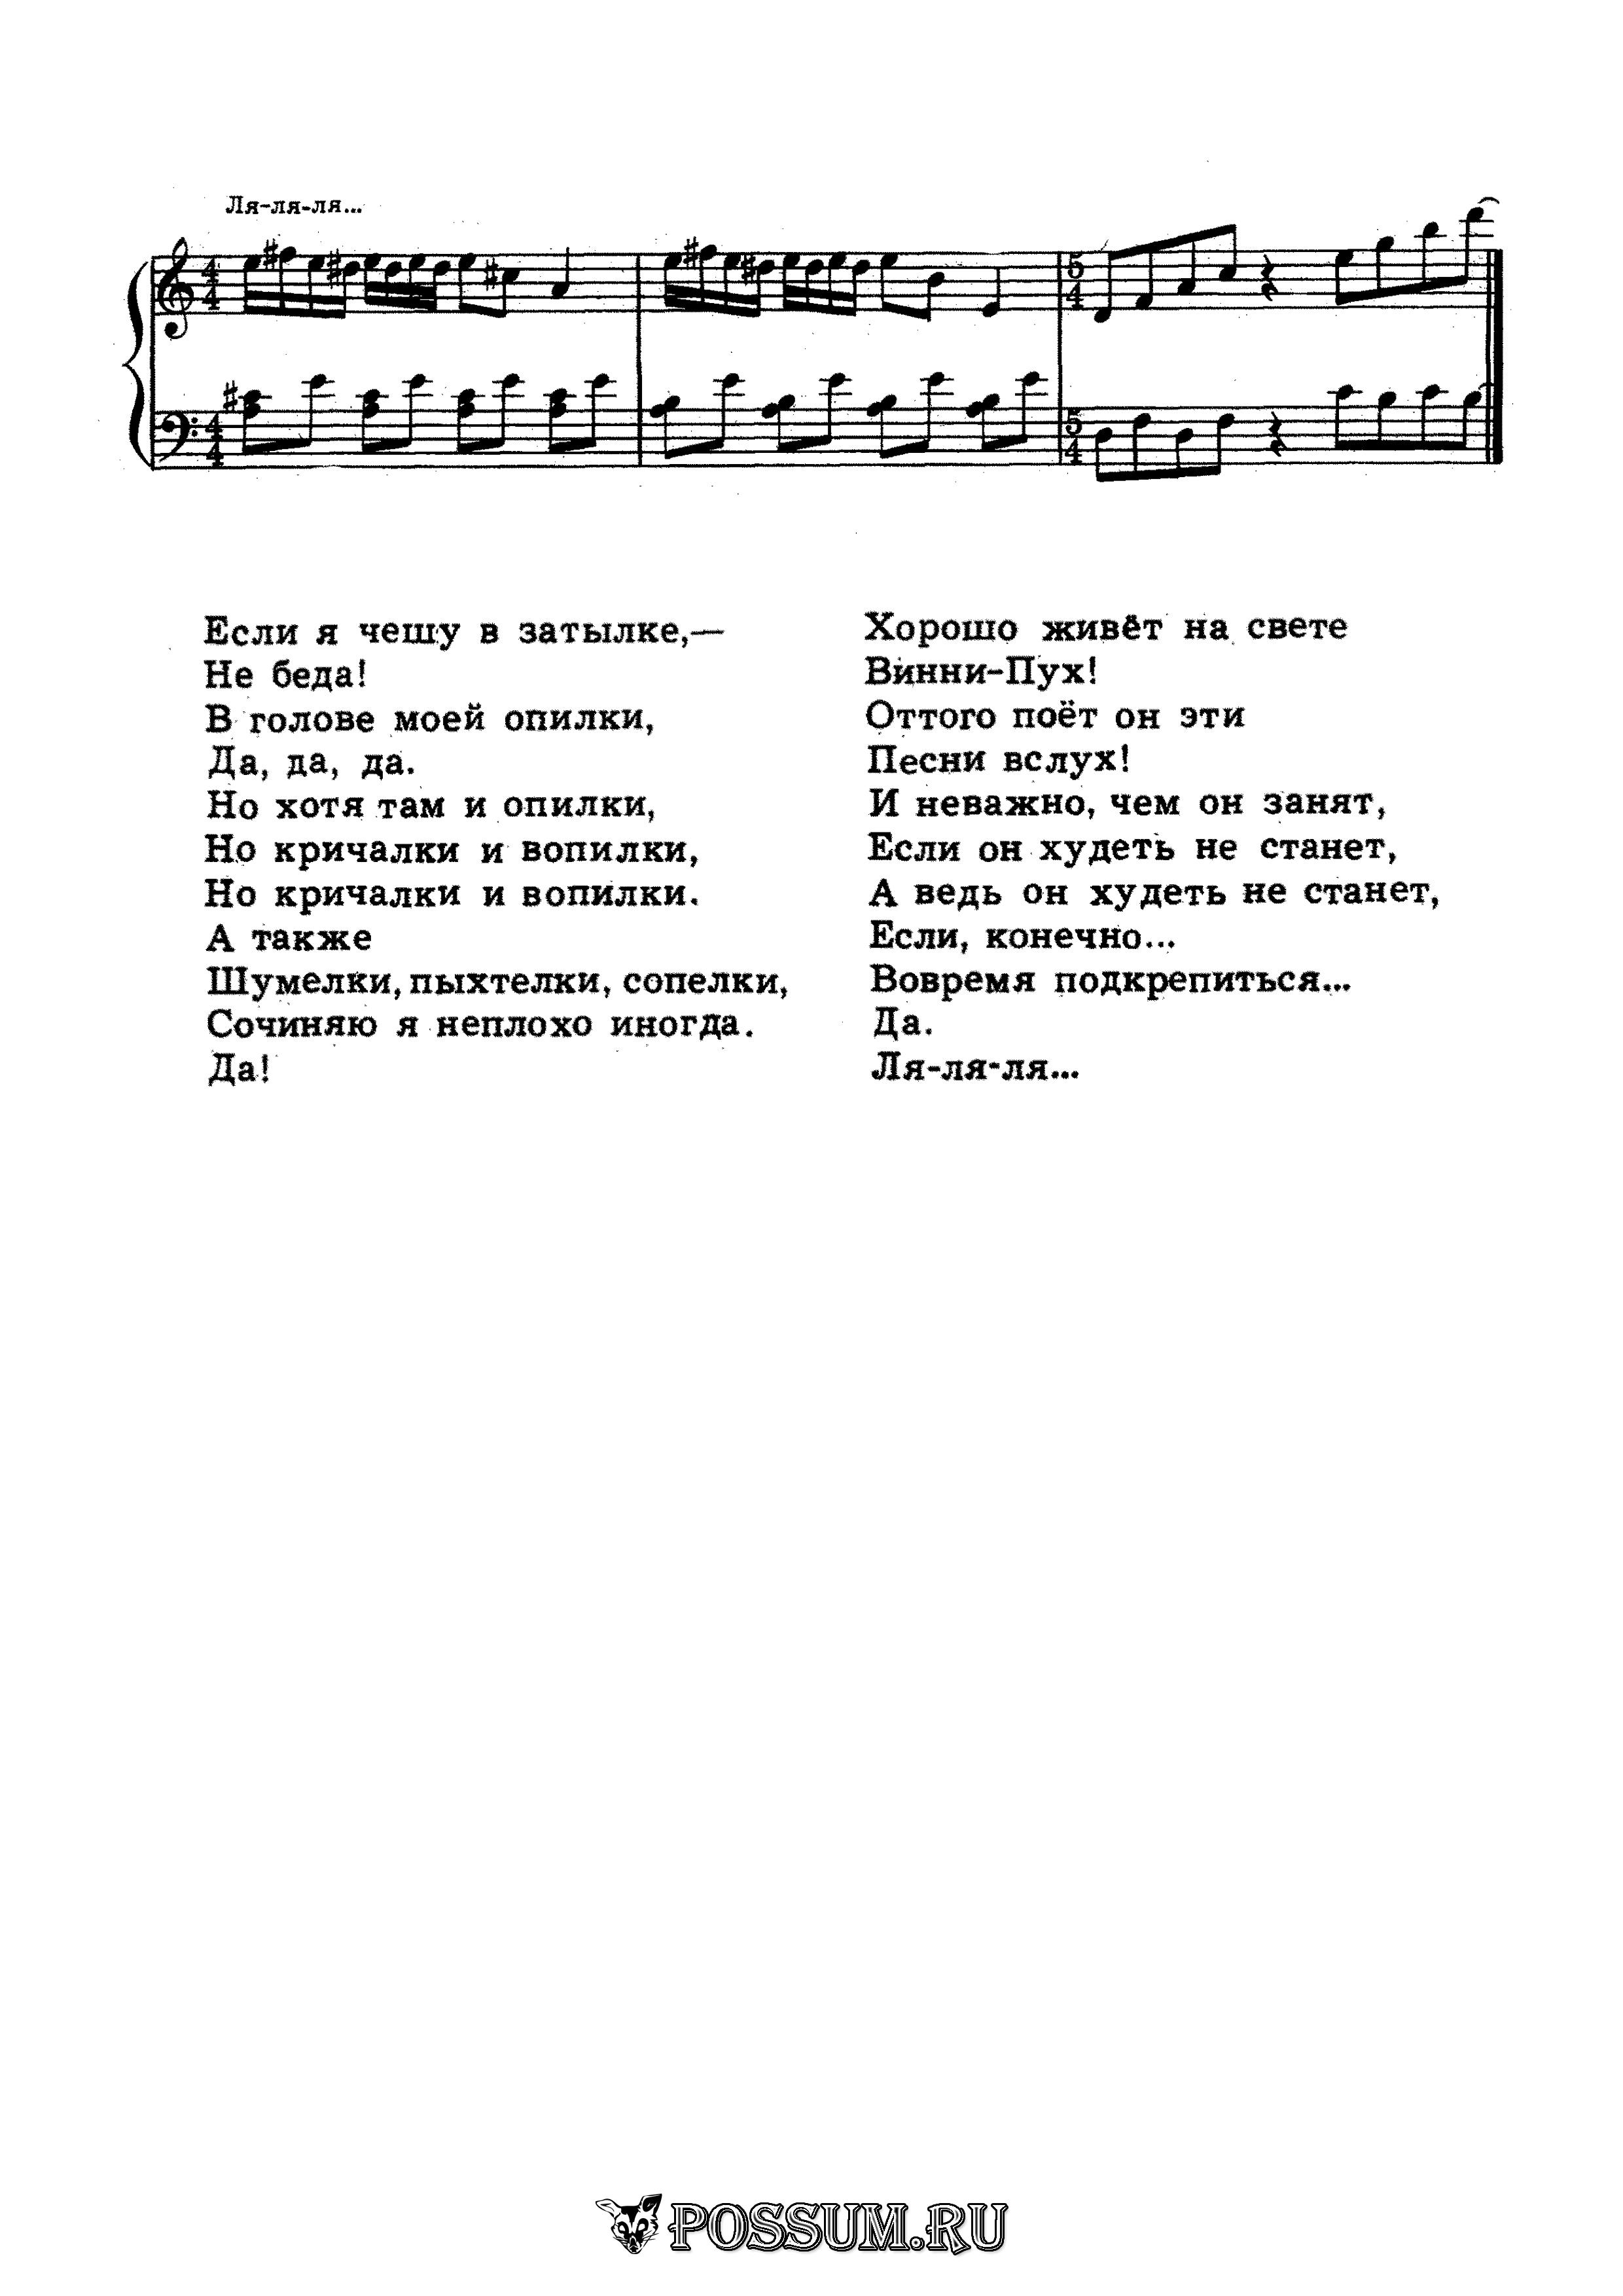 Детские песни - Песенка Винни-Пуха - аккорды и текст